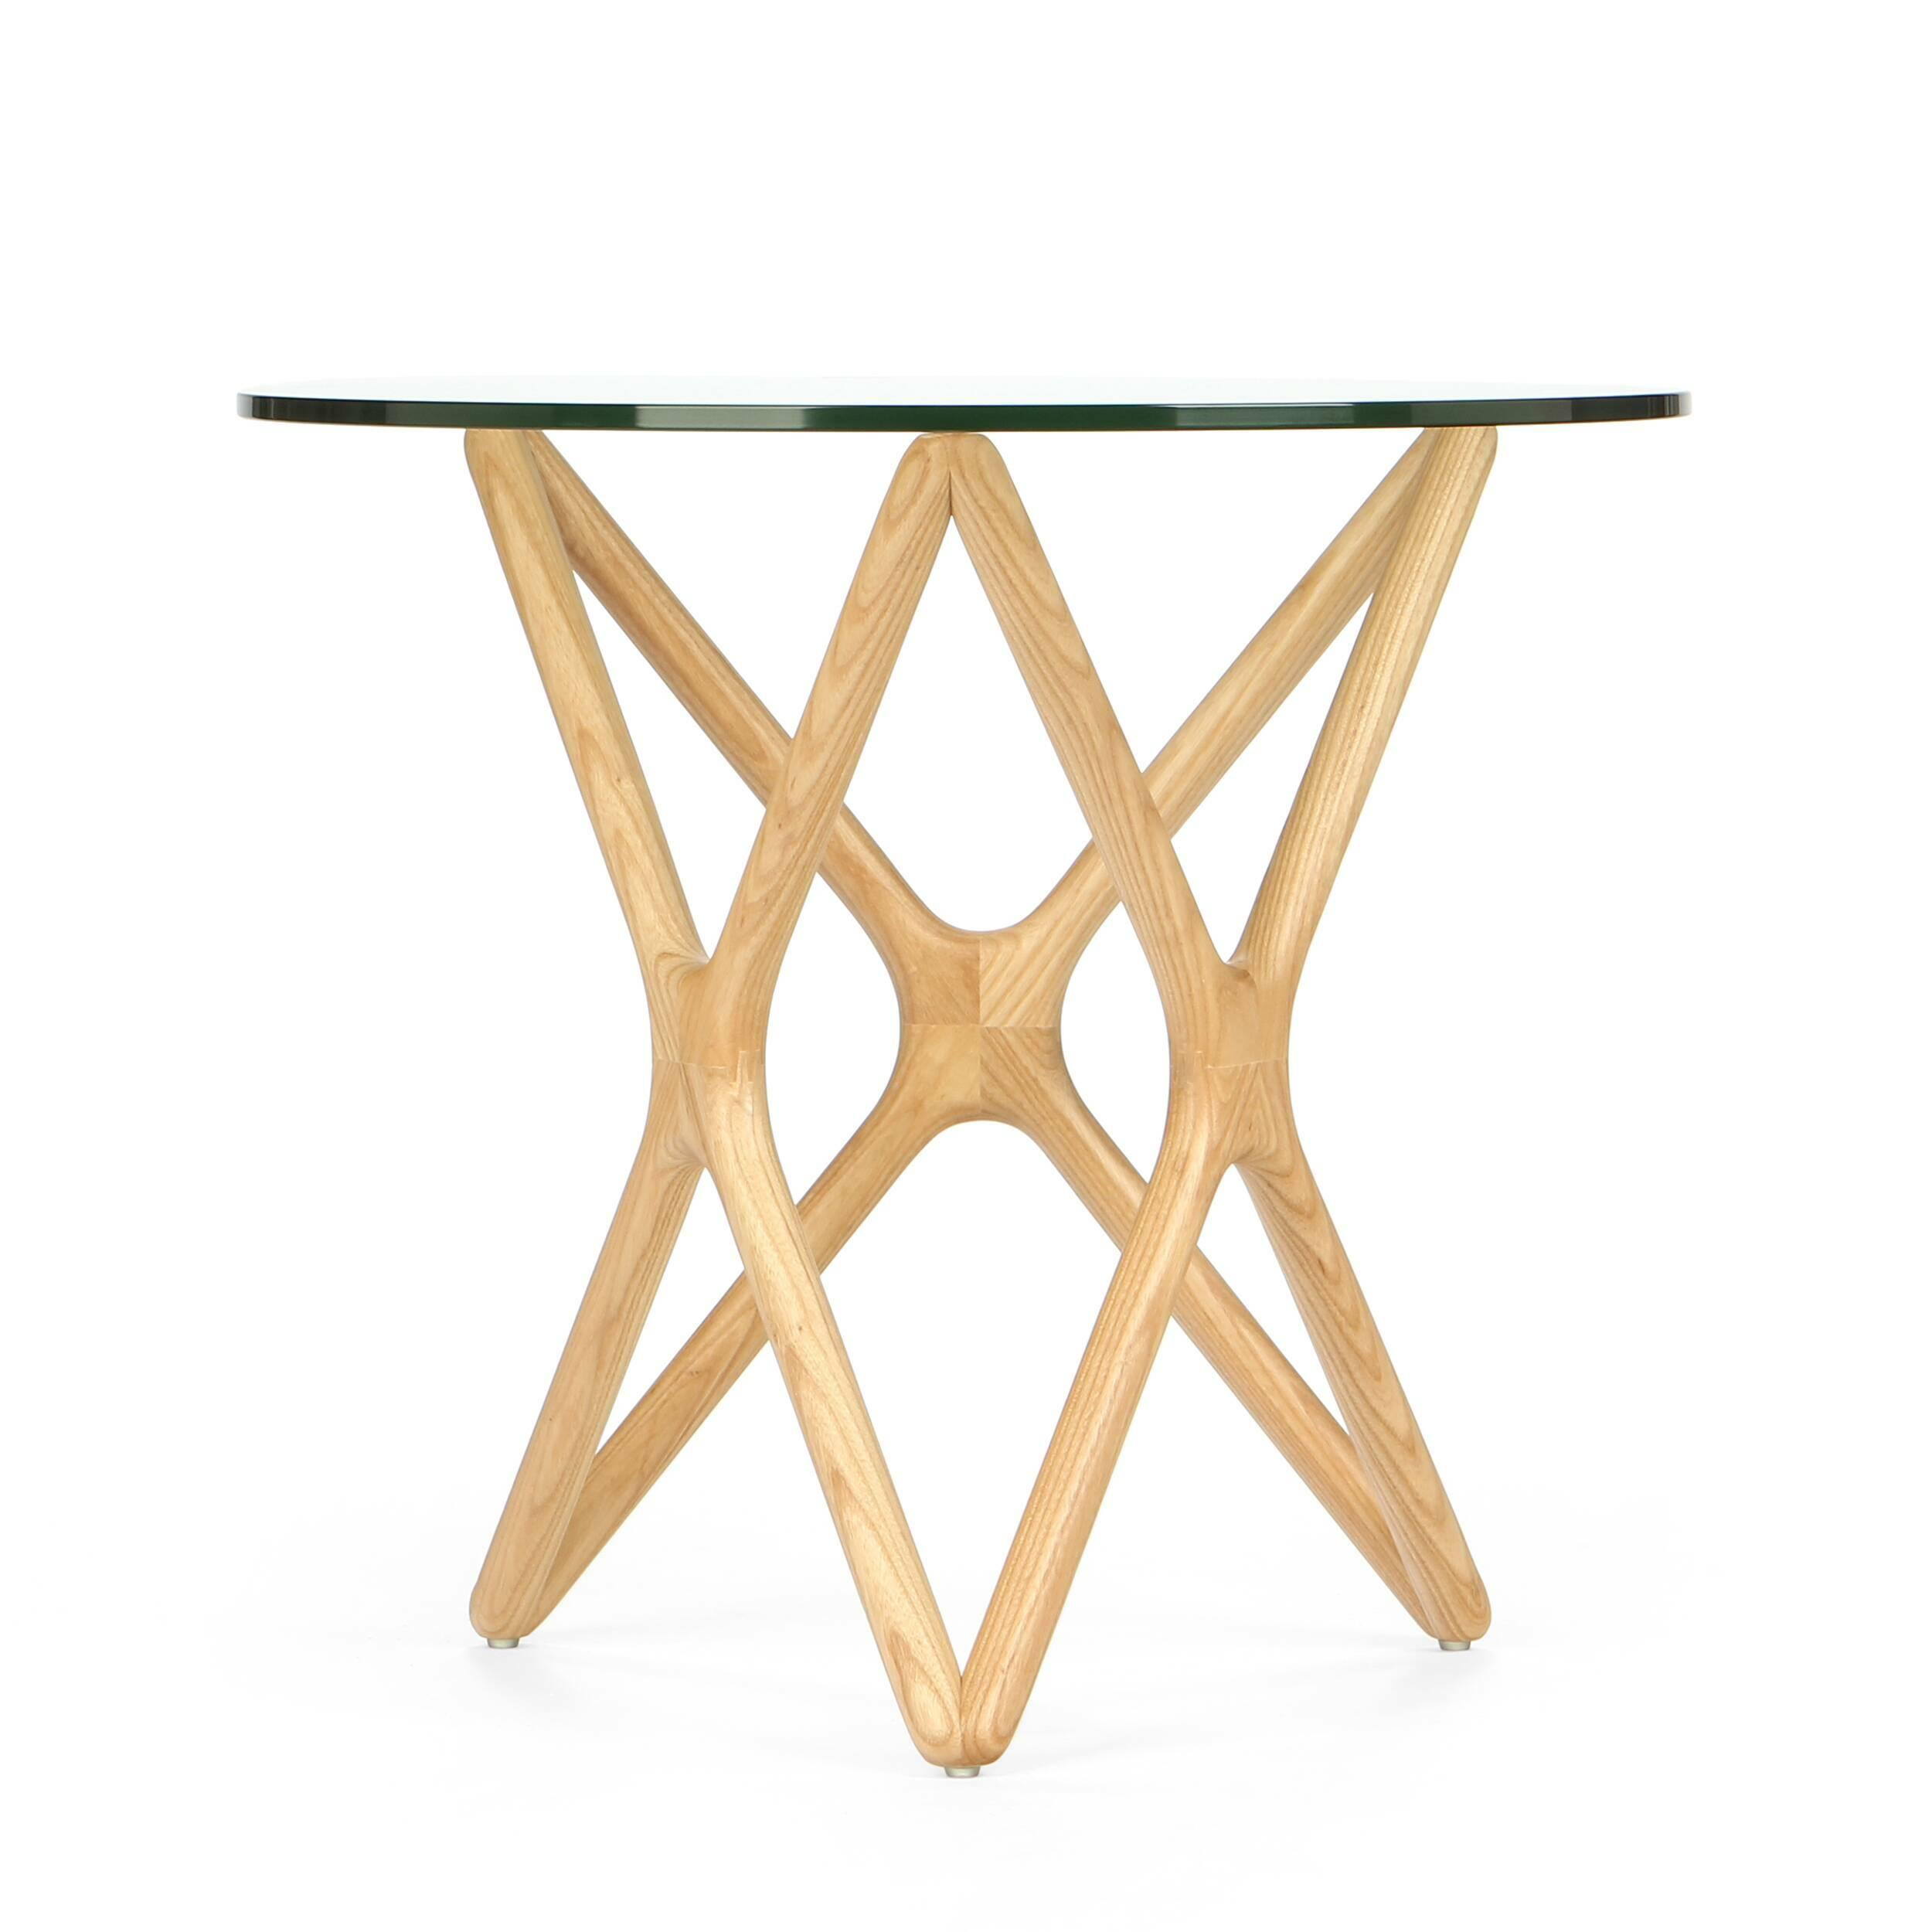 Кофейный стол Triple X высота 51 кофейный стол triple x высота 56